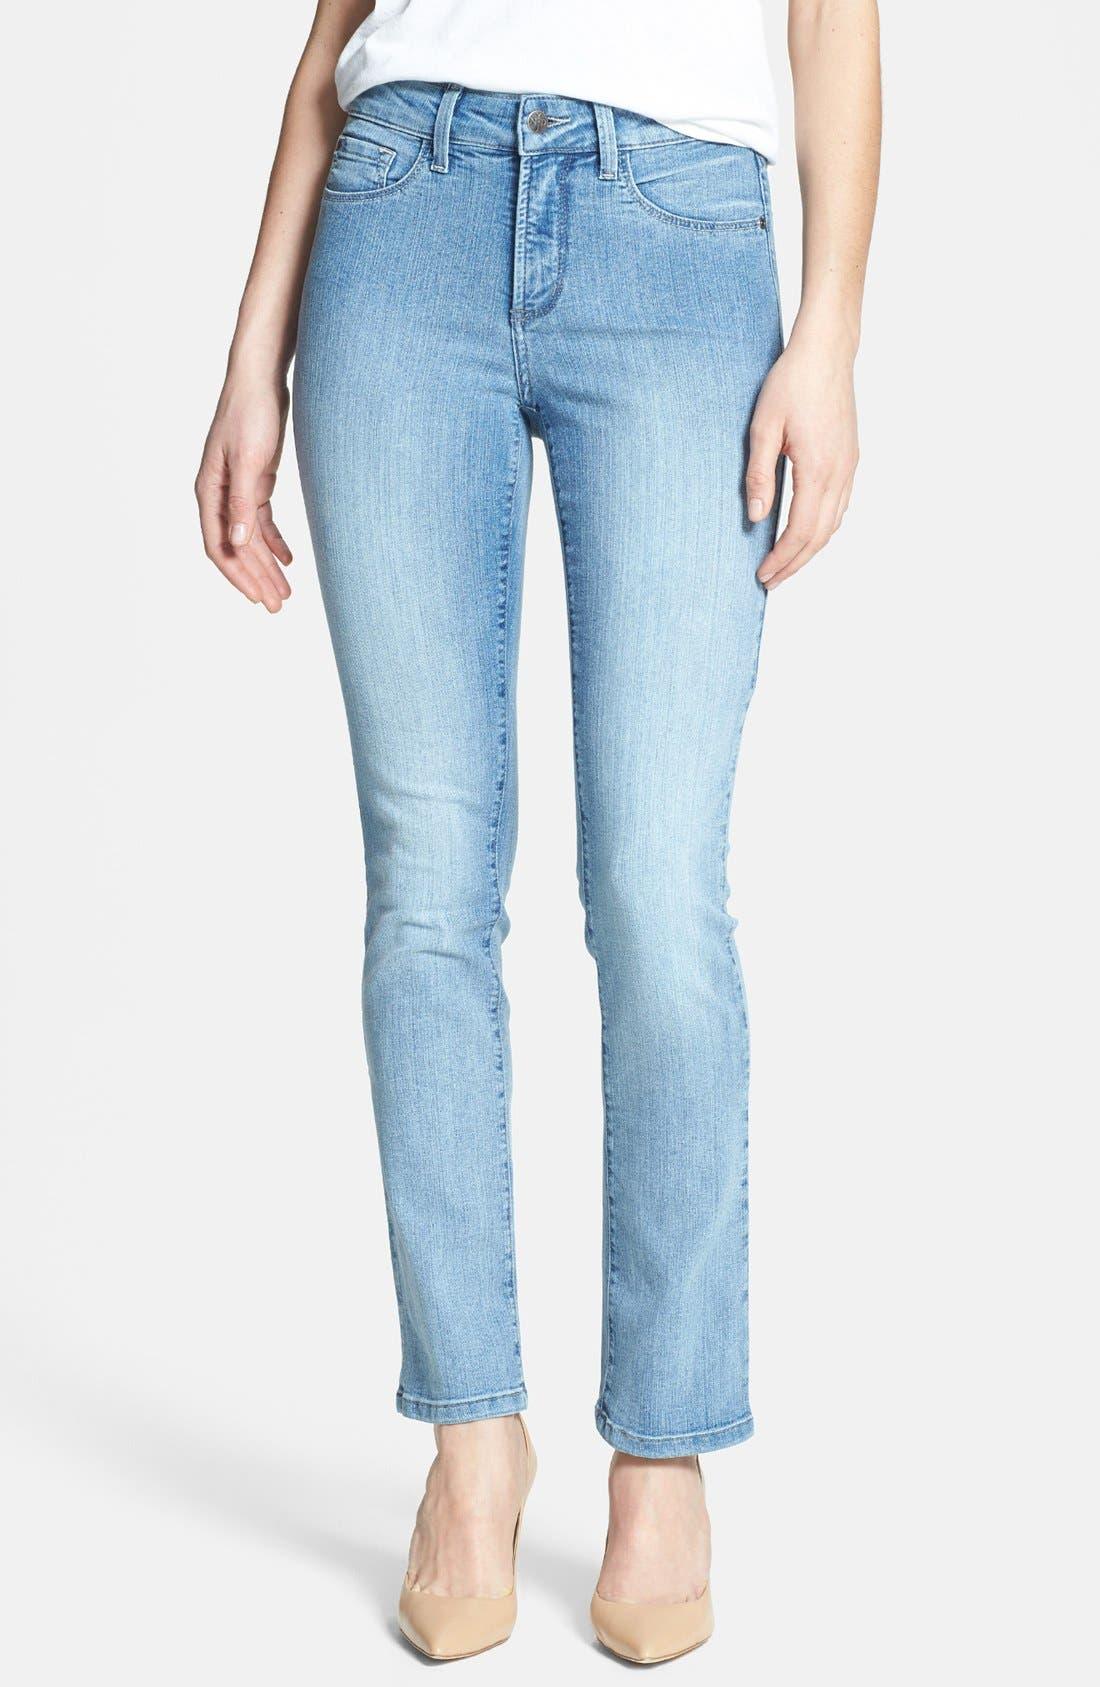 Alternate Image 1 Selected - NYDJ 'Sheri' Stretch Skinny Jeans (Palos Verdes) (Regular & Petite)